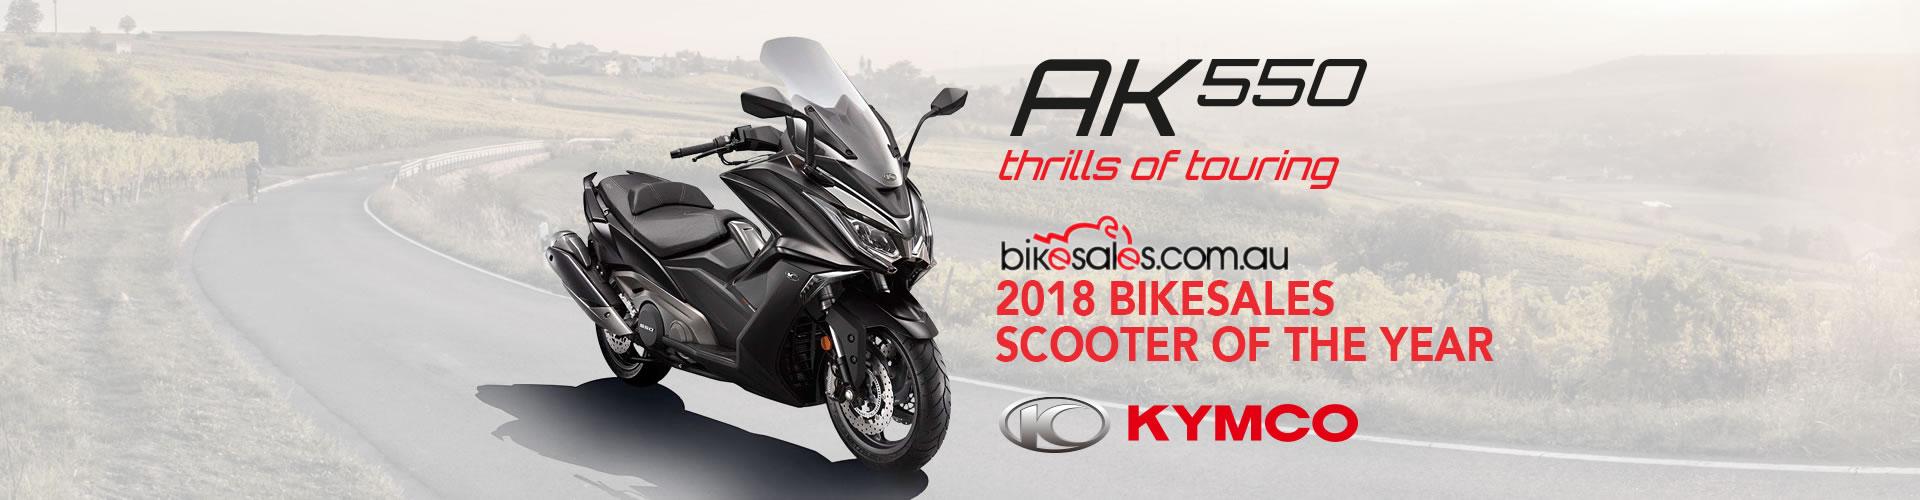 Motorcycles for sale in Tasmania | Sales, Service & Parts